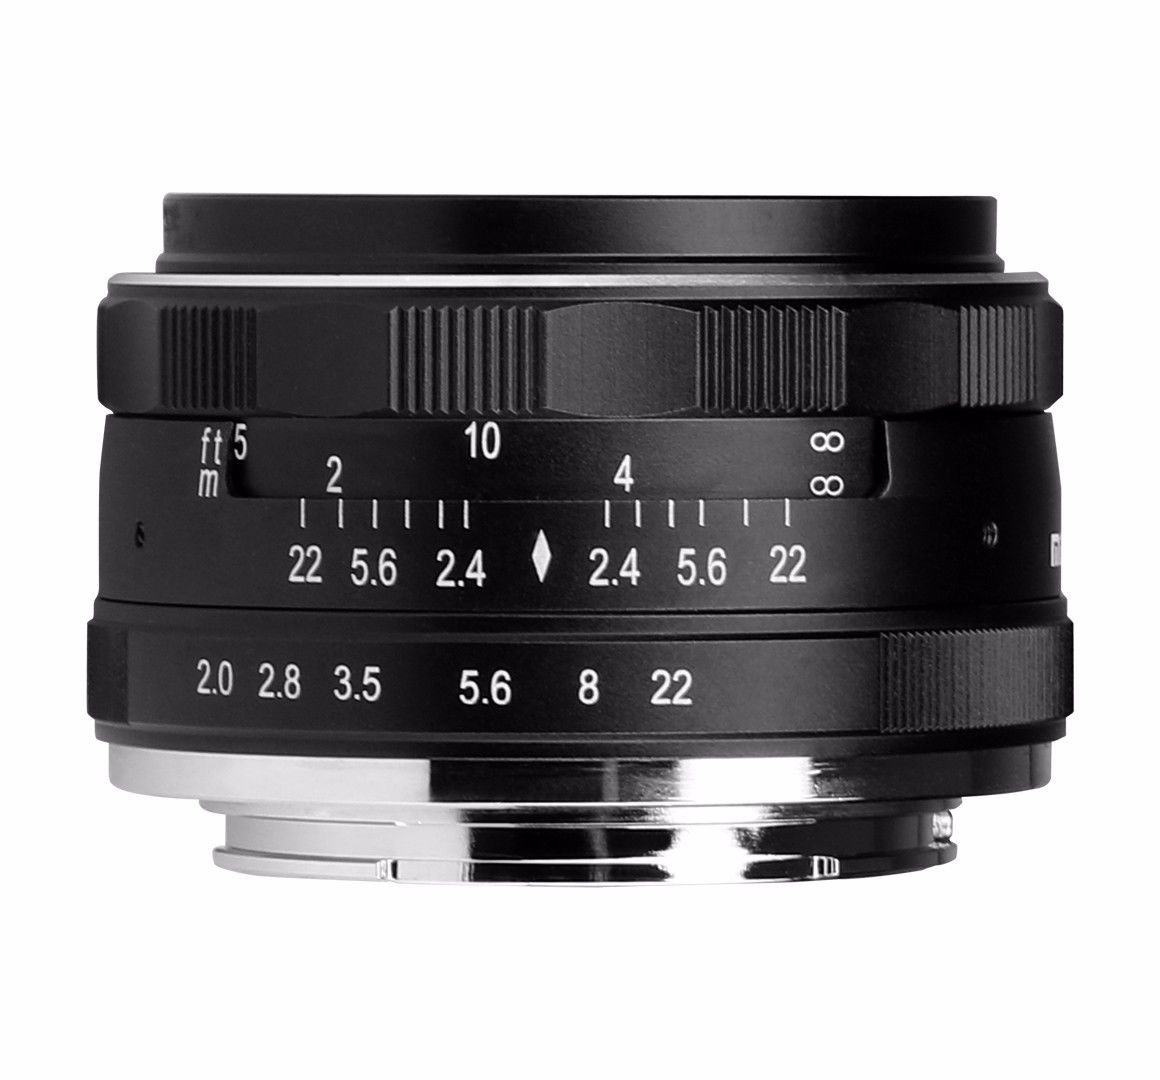 50mm F2.0 Aperture Manual Focus Lens APS-C for eosm nikon1 m43 Sony e mount NEX3/5T/6/7 A5000 A6000 a6300 fuji xt1 camera kaxinda metal 35mm f 1 7 lens for m4 3 nex fx eosm n1 p q e1 aps c mirrorless